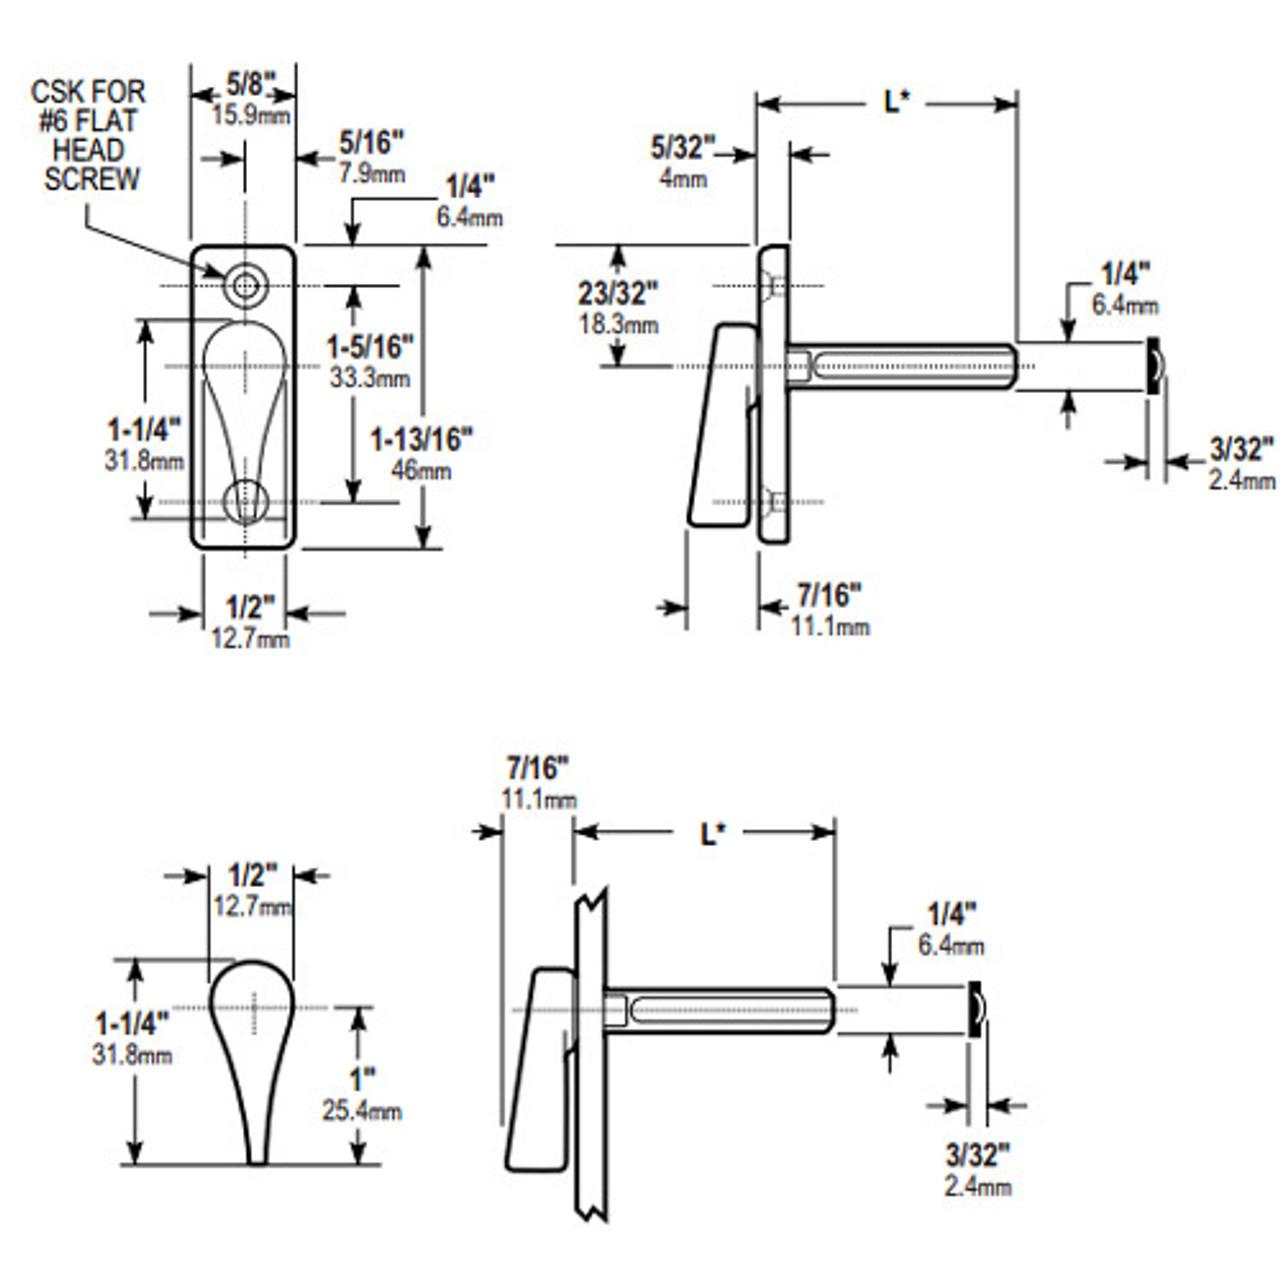 1000-21-21-130 Adams Rite 1000 Series Turns Dimensional View